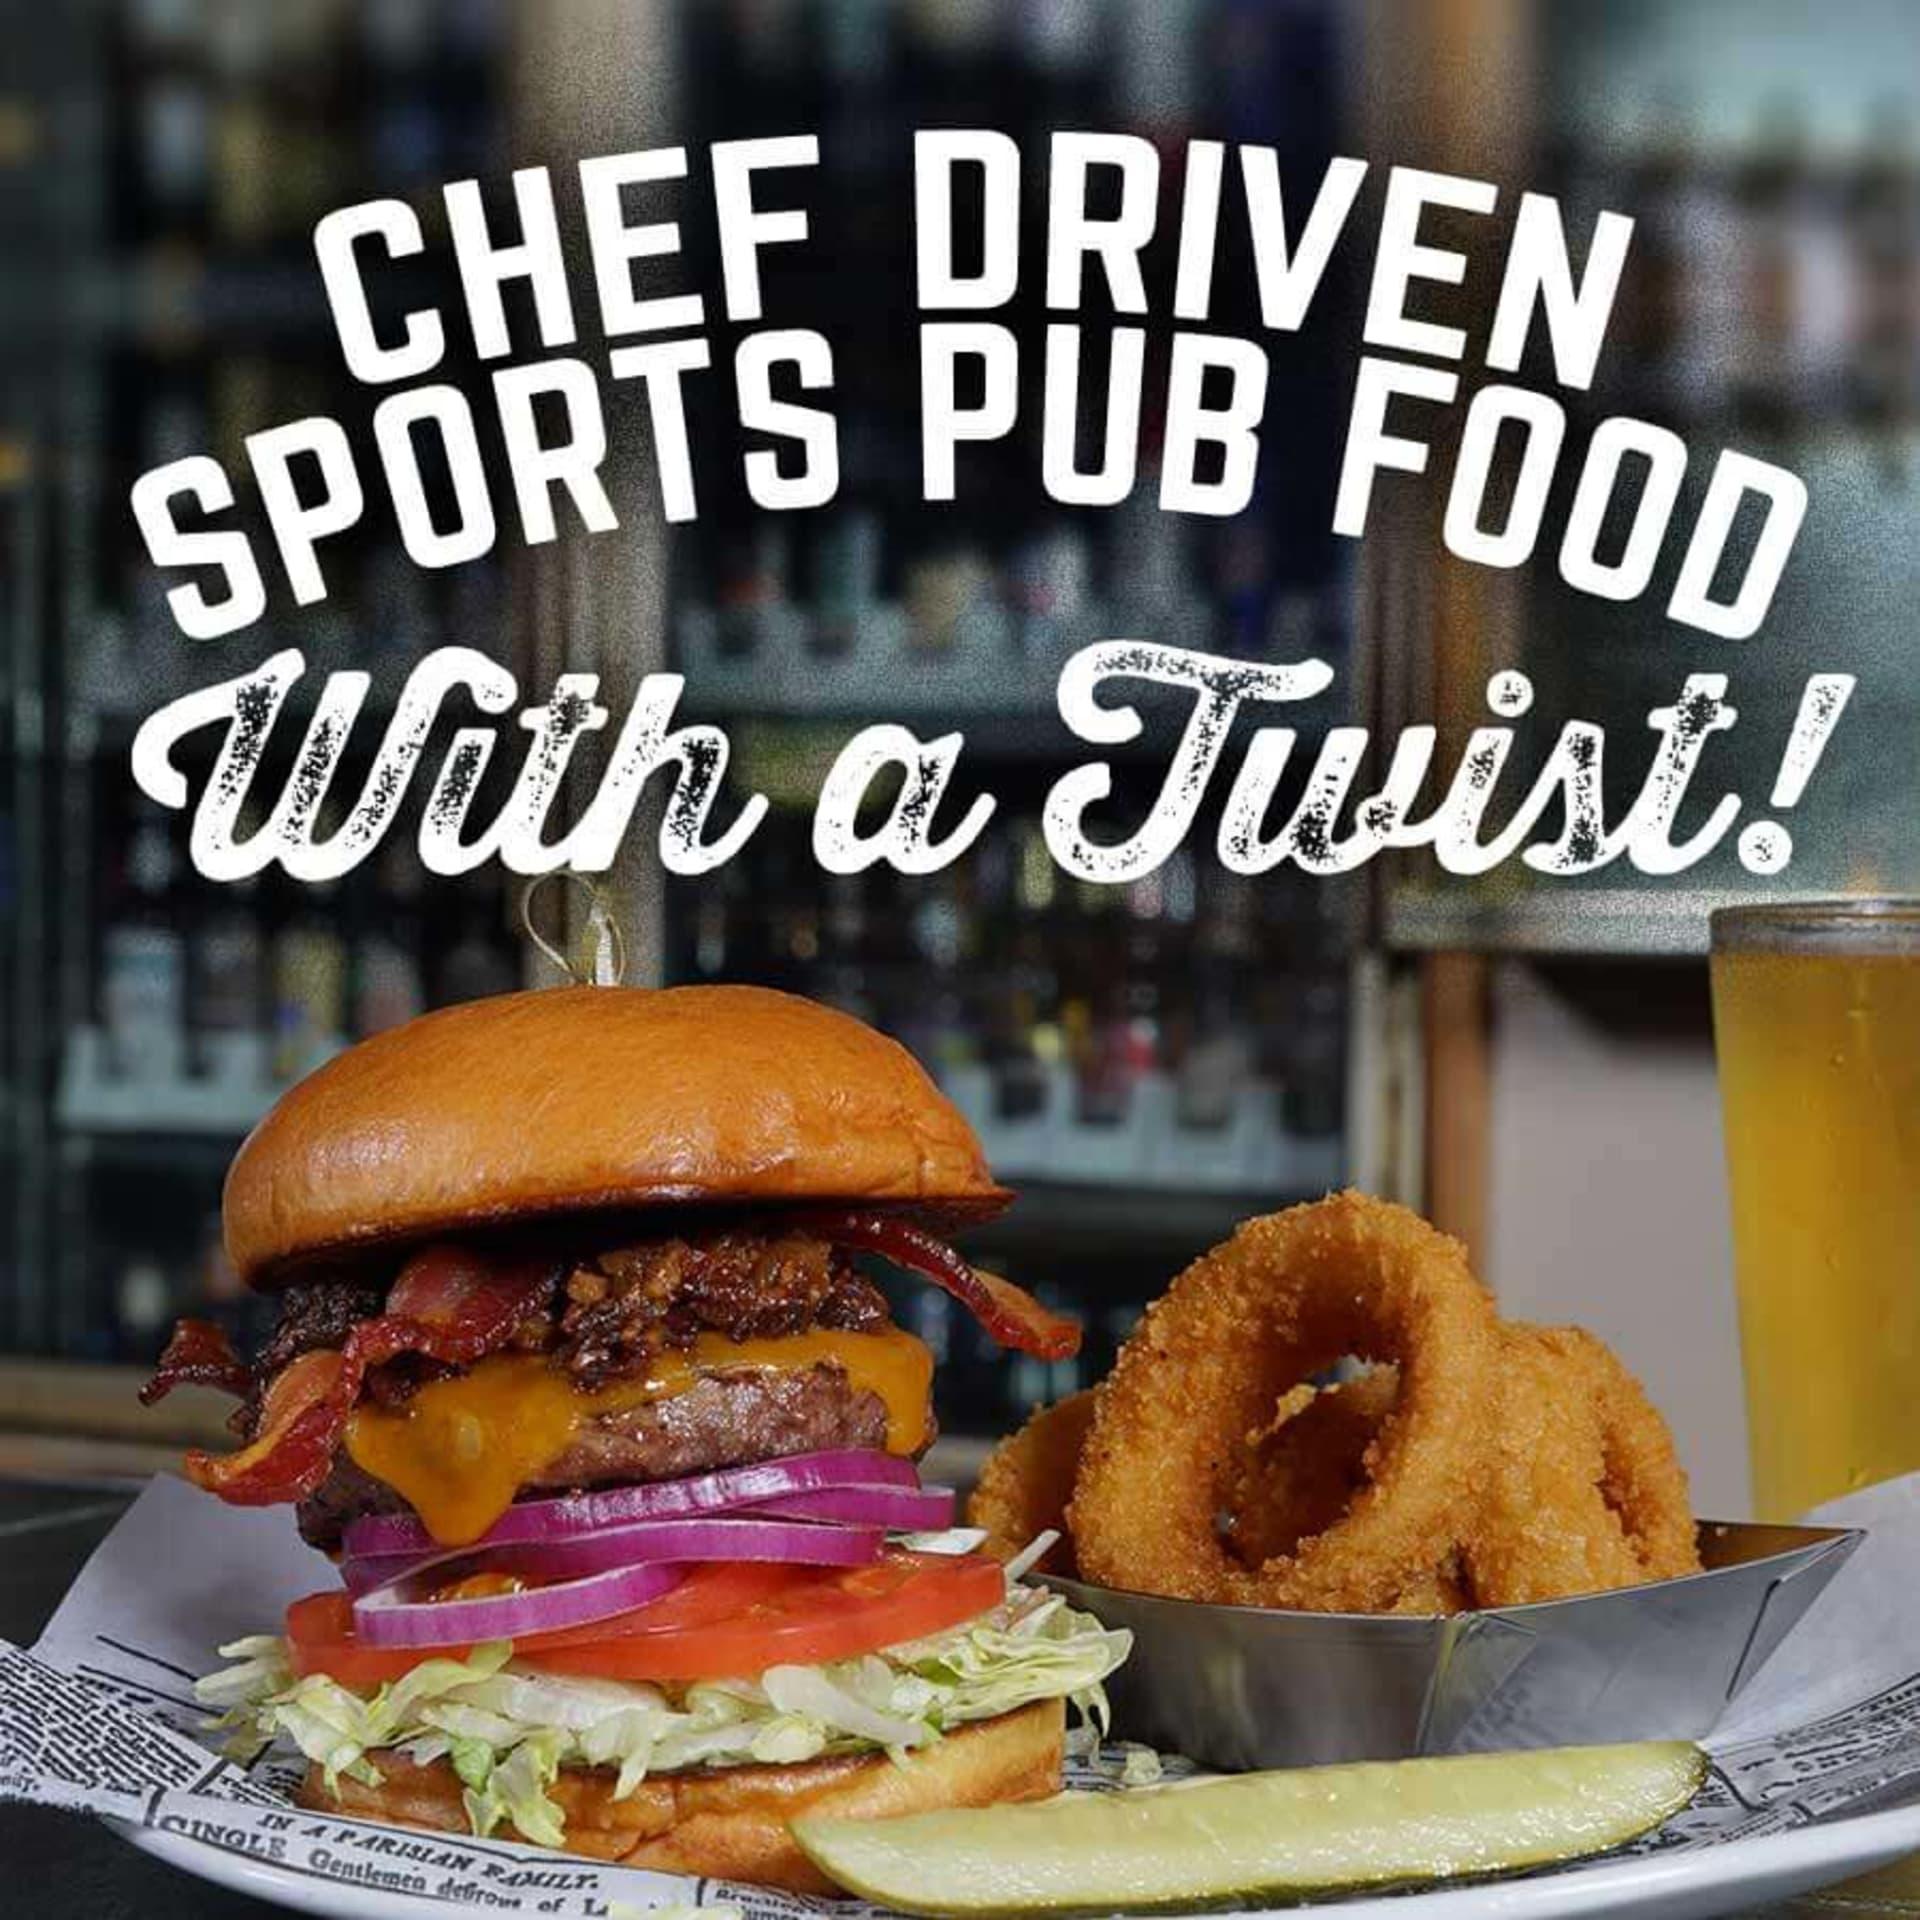 chef driven sports pub food with a twist